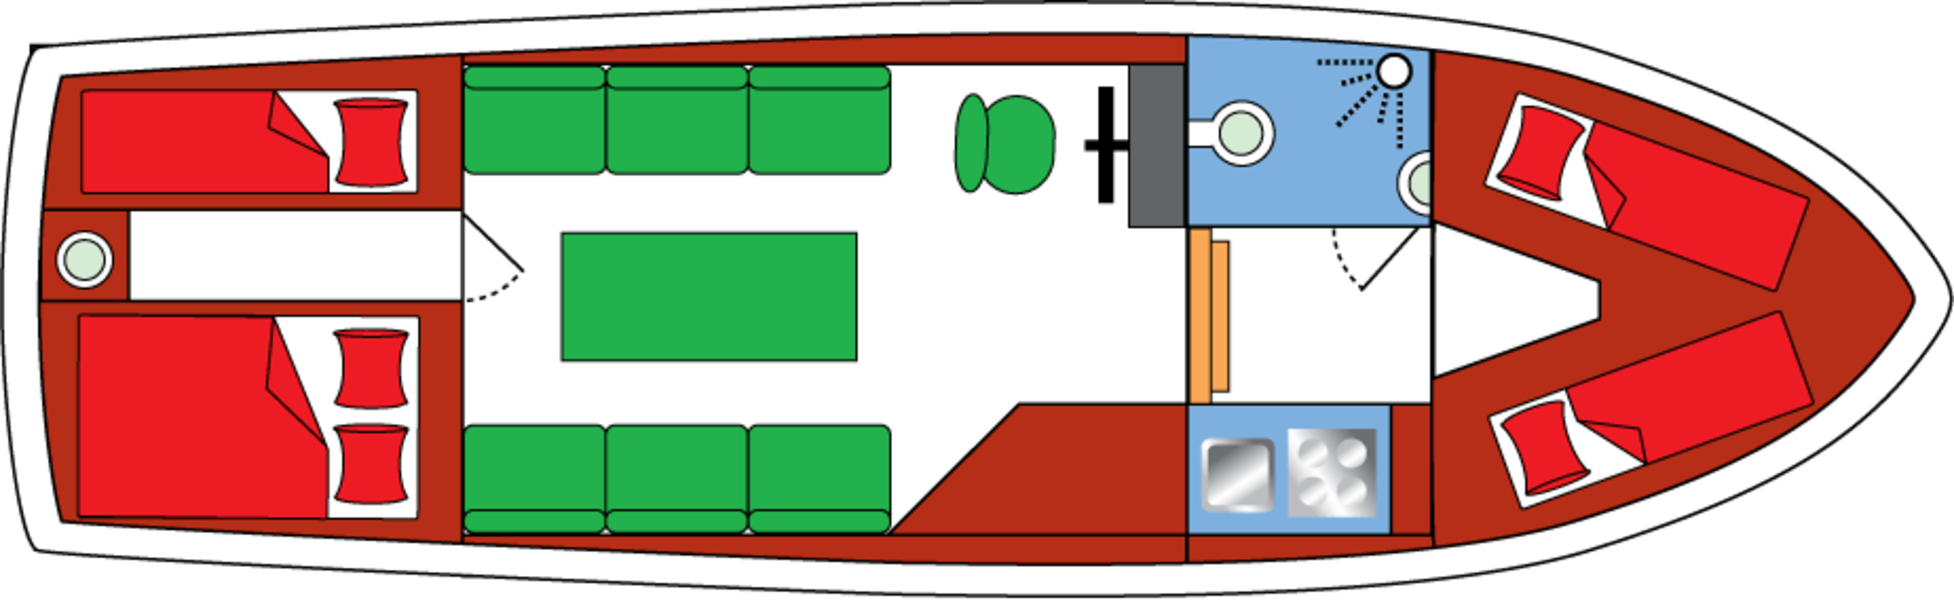 Palan DL 1100 - Toemaar